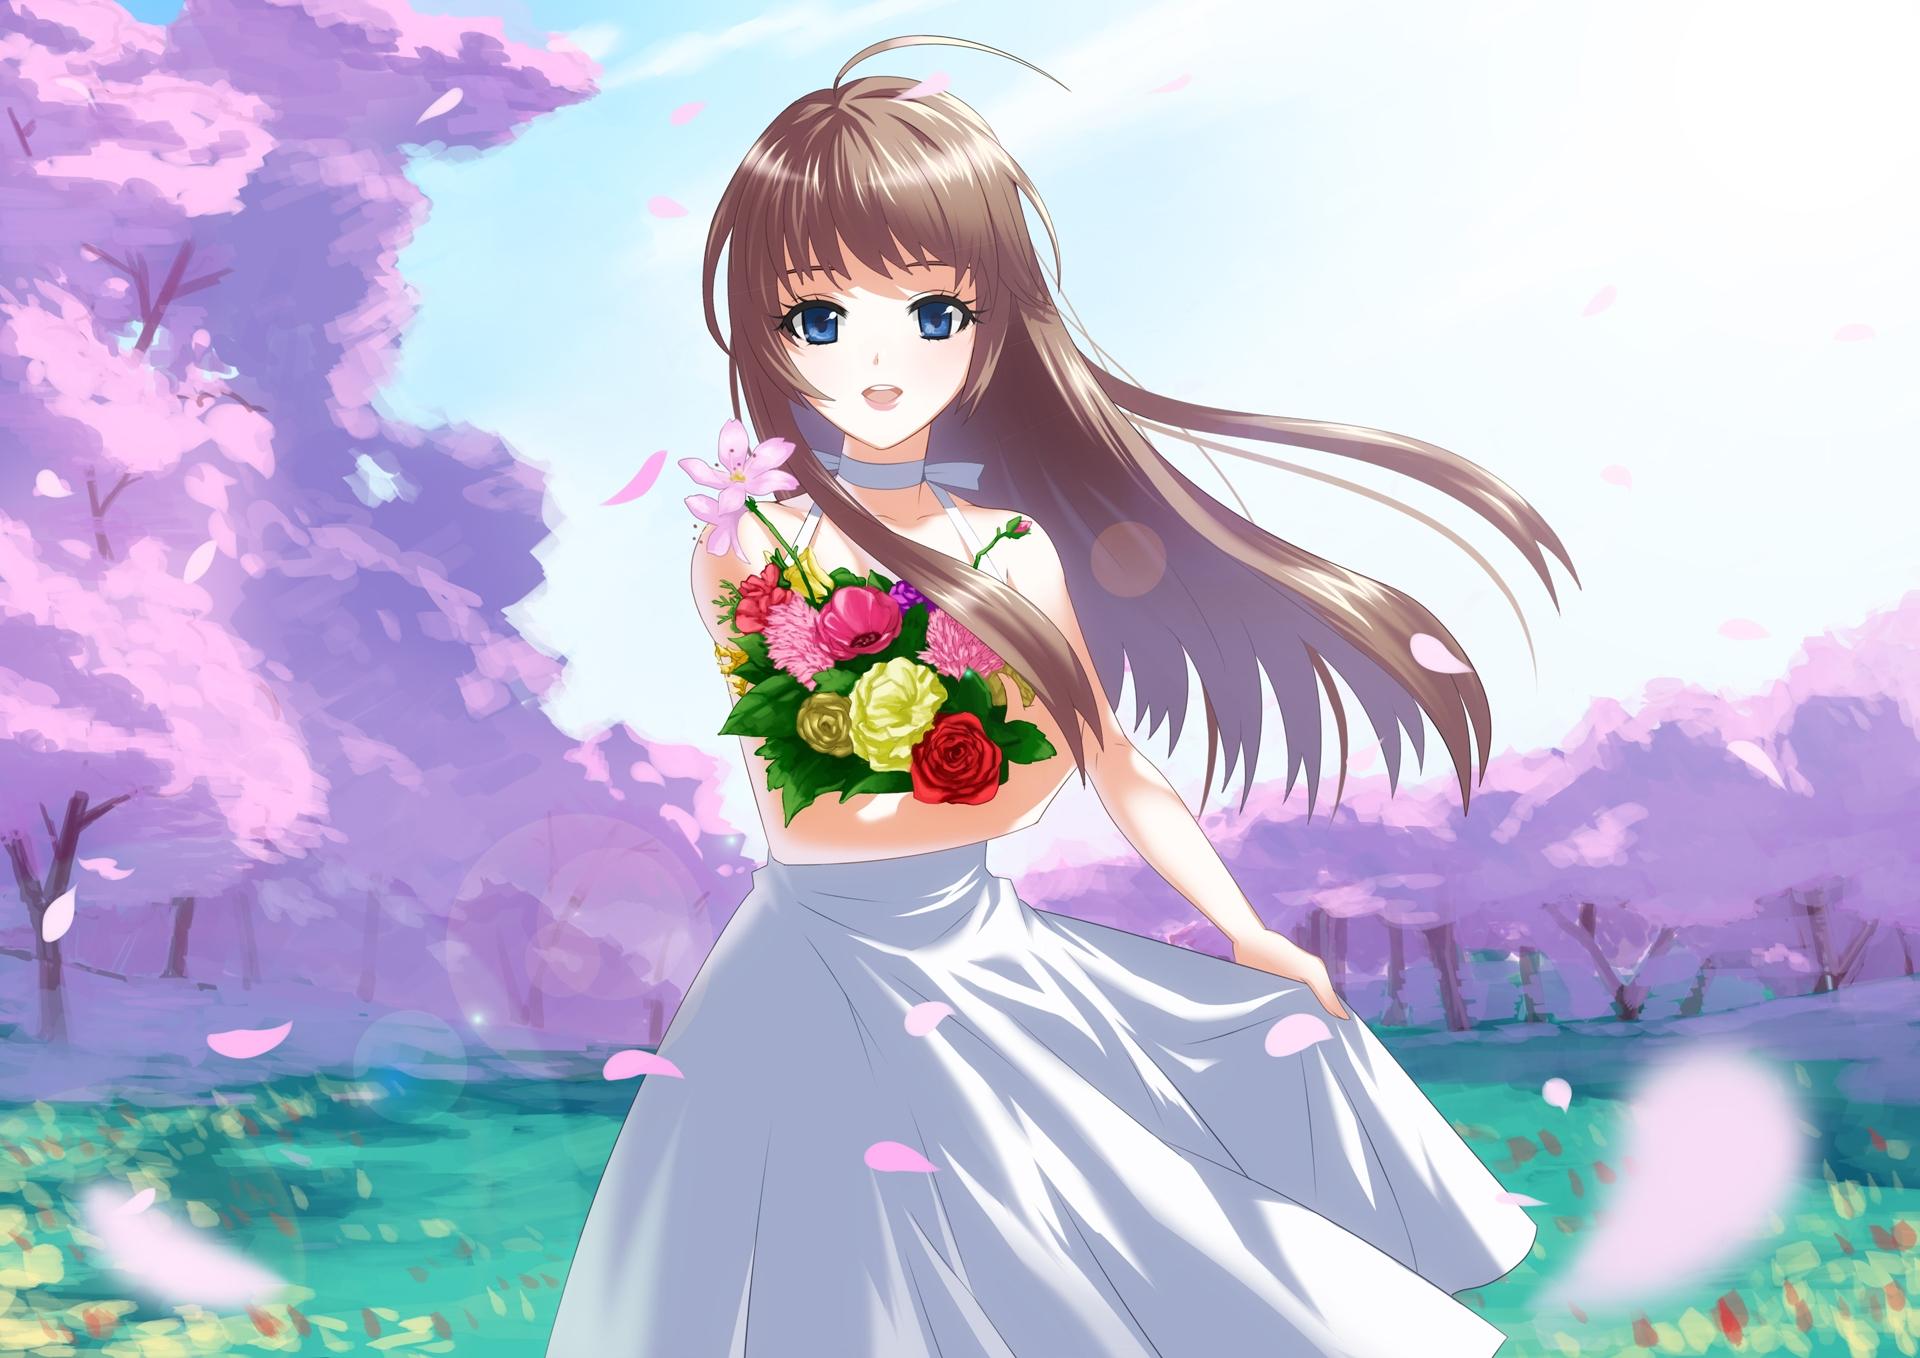 wallpaper : anime, girl, brunette, flowers, bouquet, joy 1920x1358